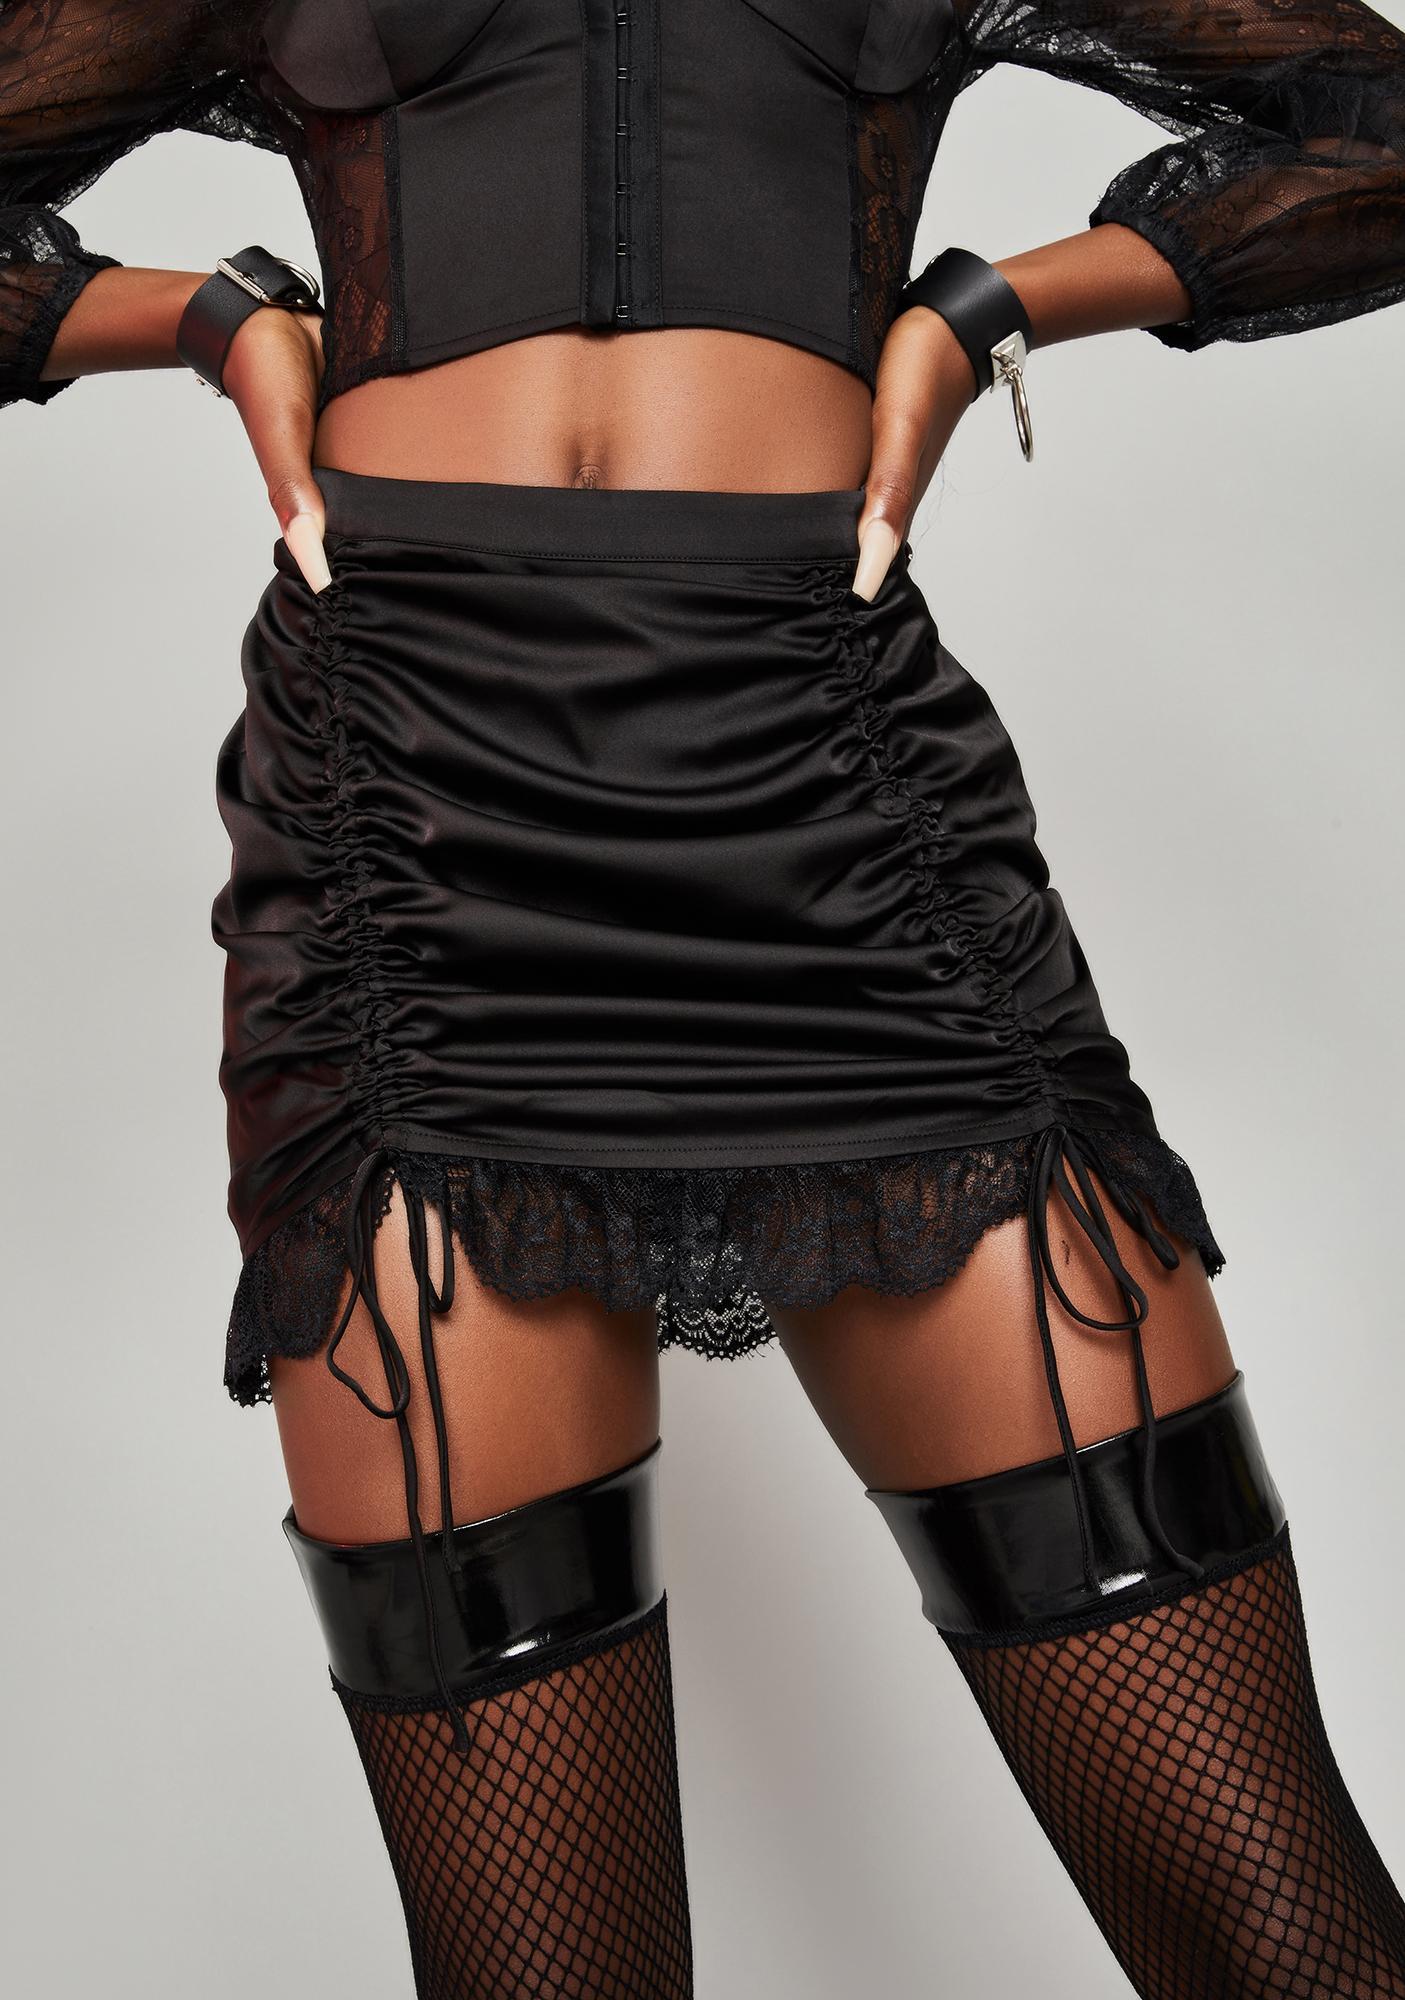 HOROSCOPEZ Romantic Heights Ruched Skirt